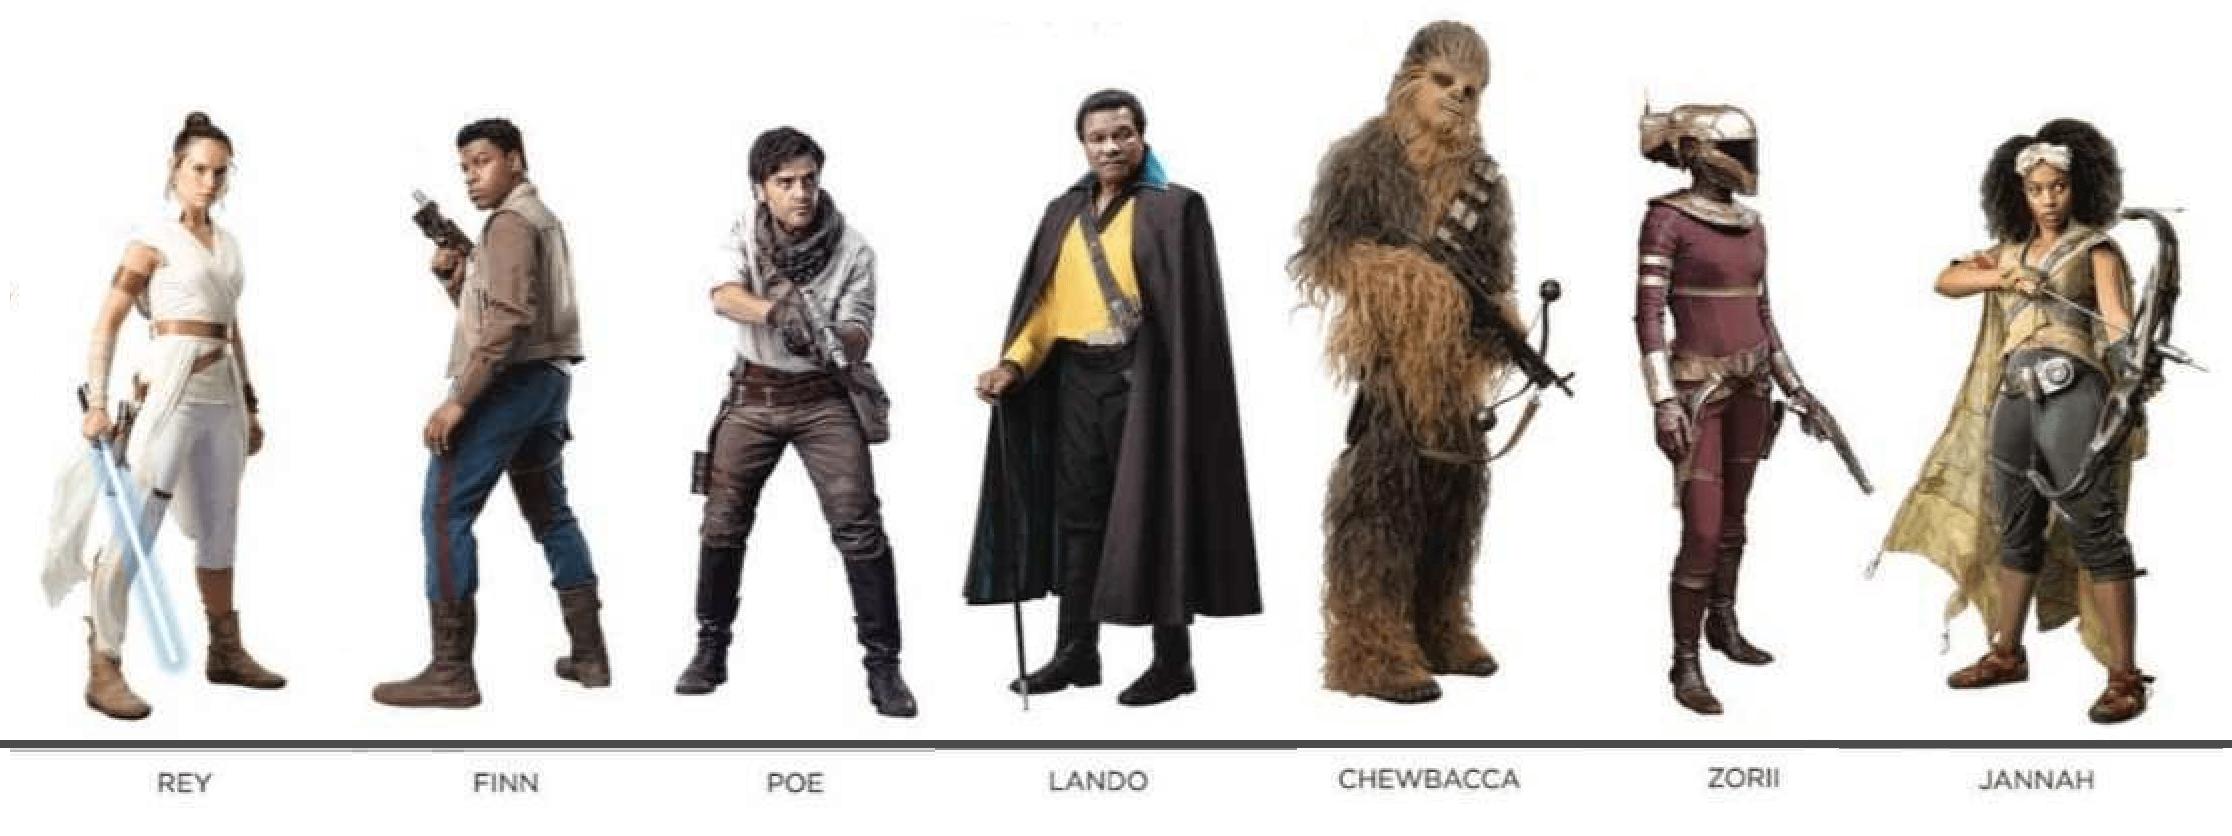 Star Wars Episode IX Rey Poe Finn Lando Chewbacca Zorii Jannah